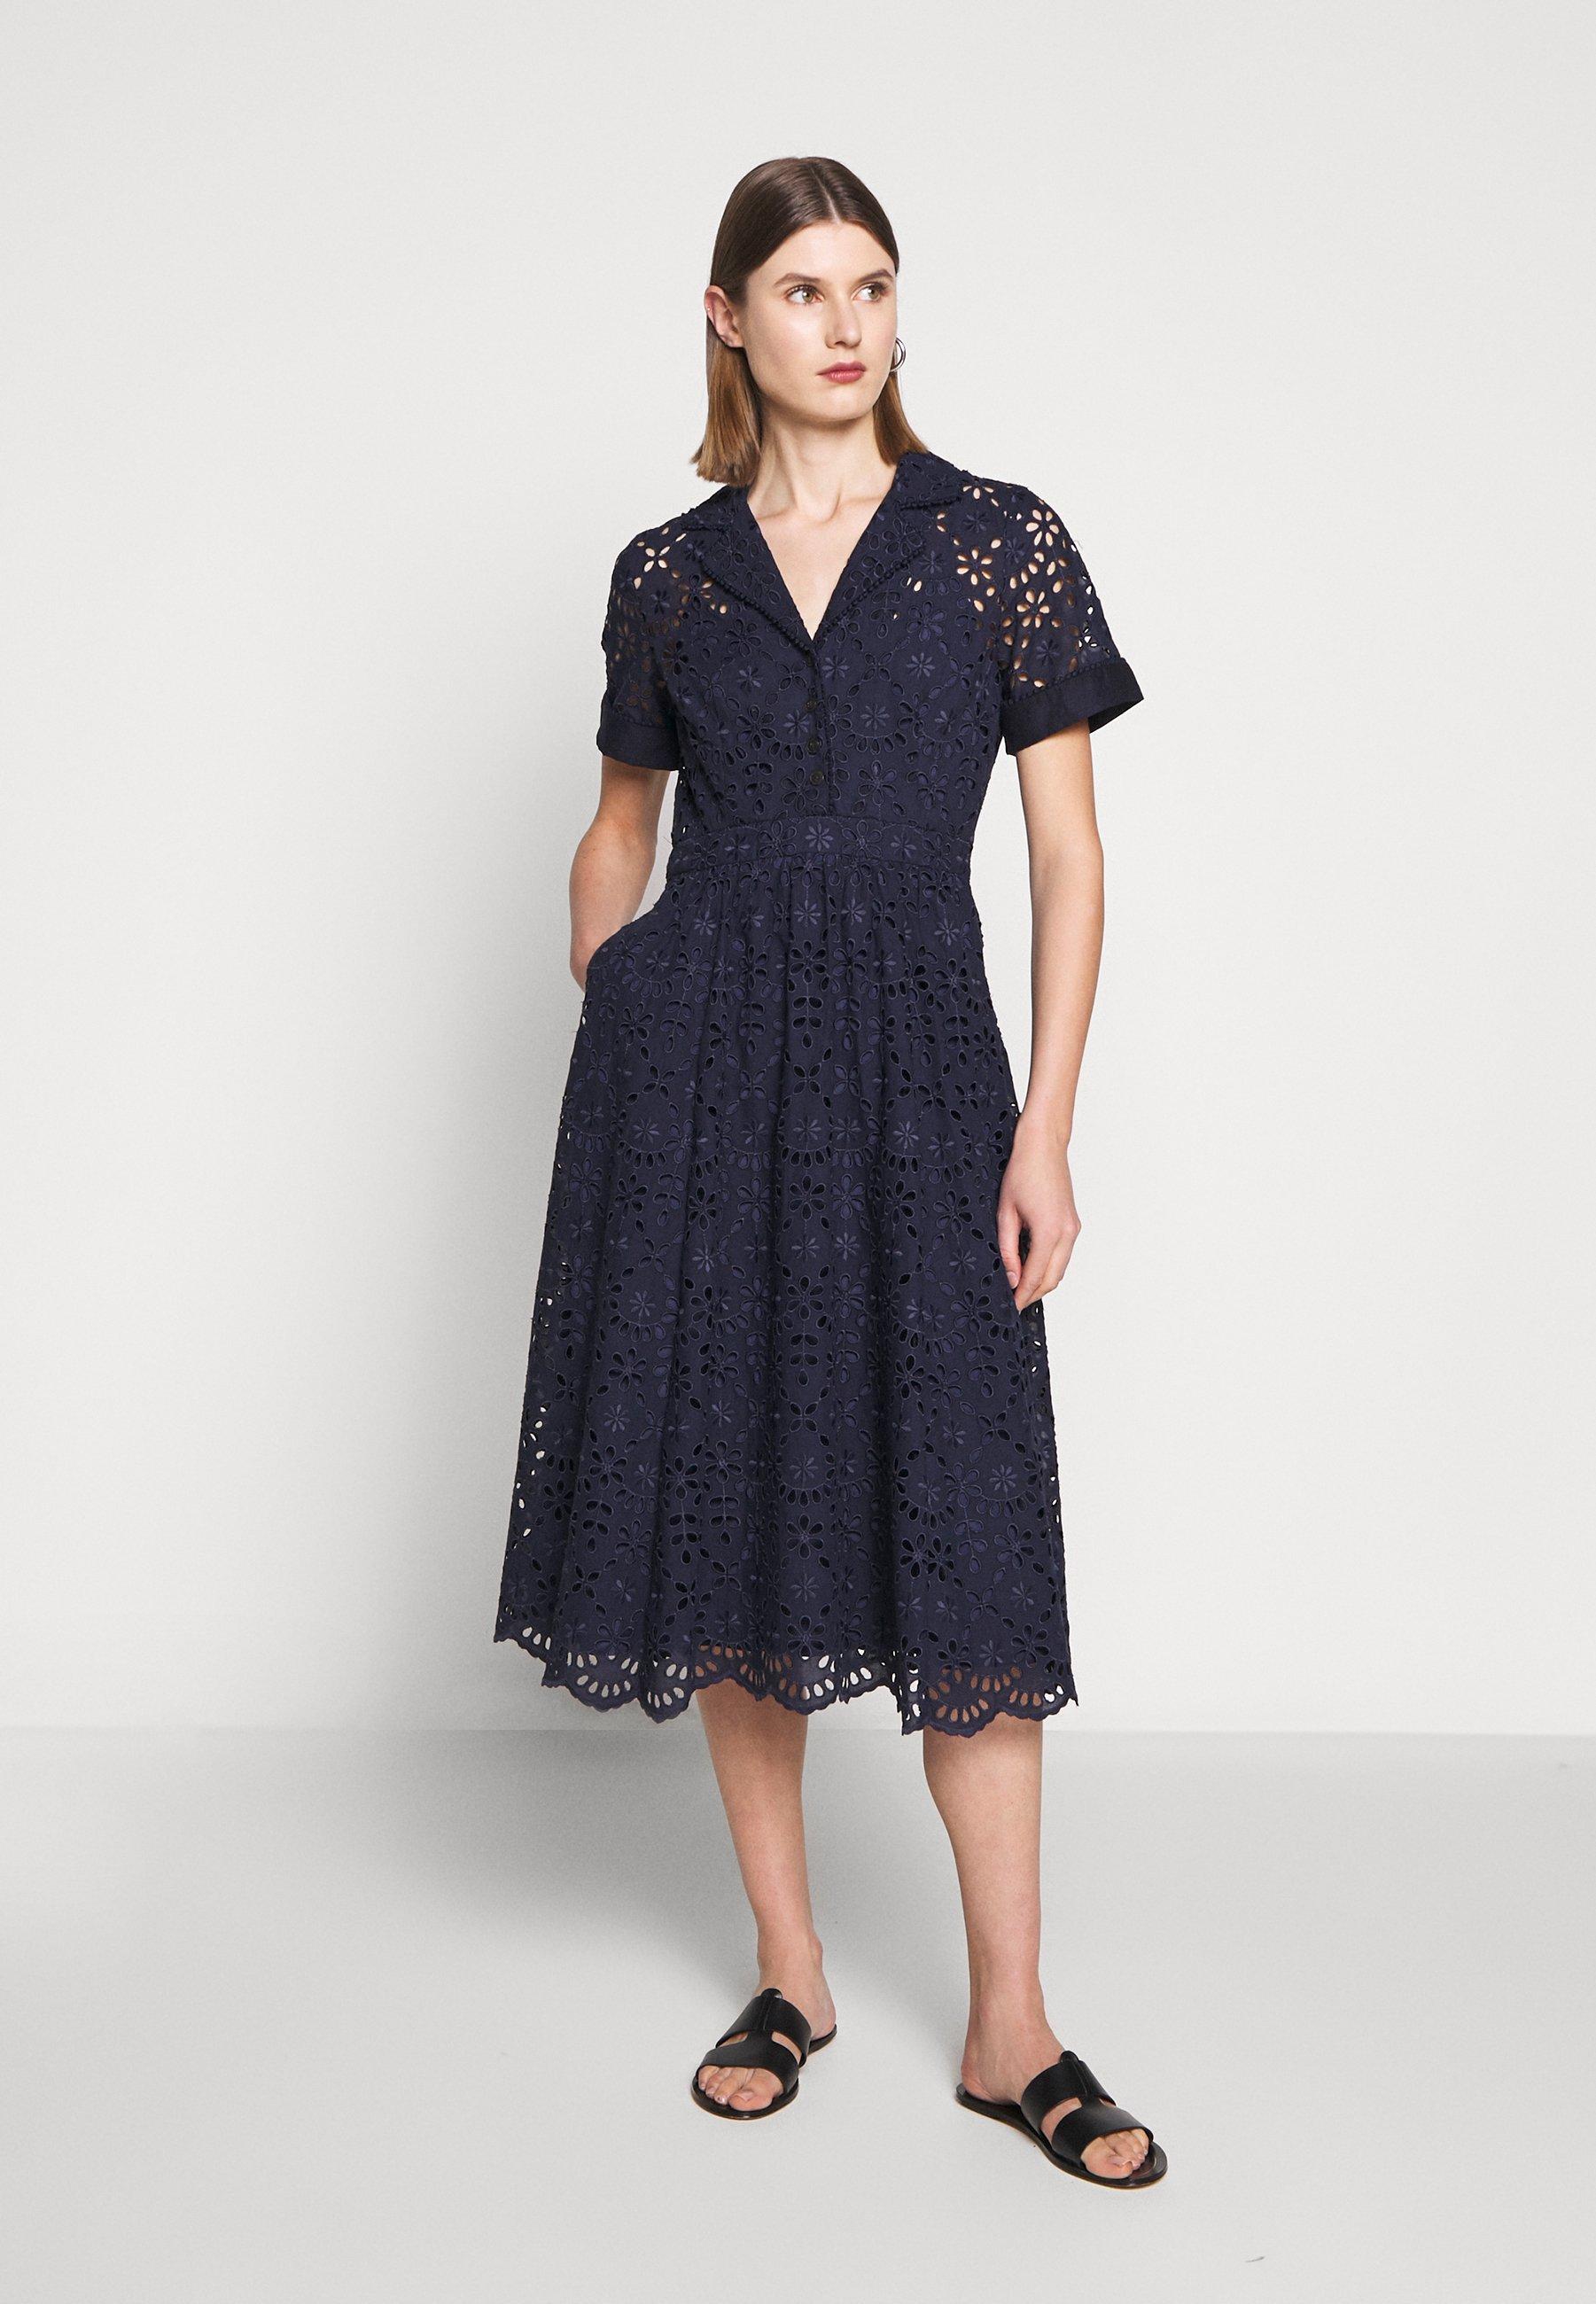 Original Wholesale J.CREW MAHALIA DRESS - Shirt dress - navy | women's clothing 2020 hOPs2